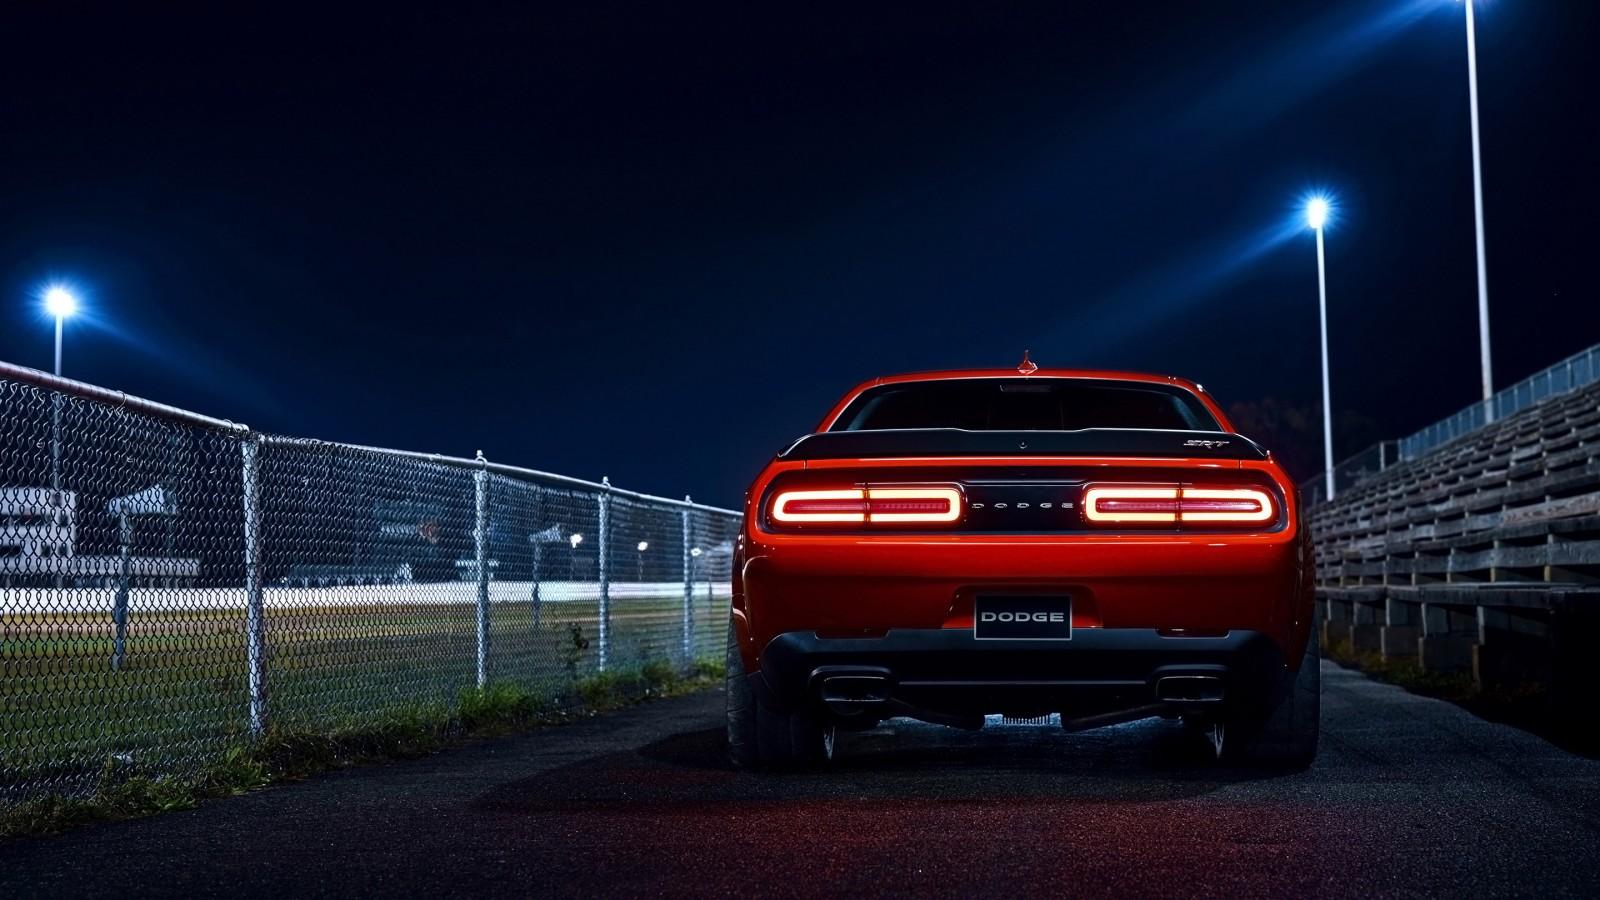 Rolls Royce Car Hd Wallpapers 1080p 2018 Dodge Challenger Srt Demon 6 Wallpaper Hd Car